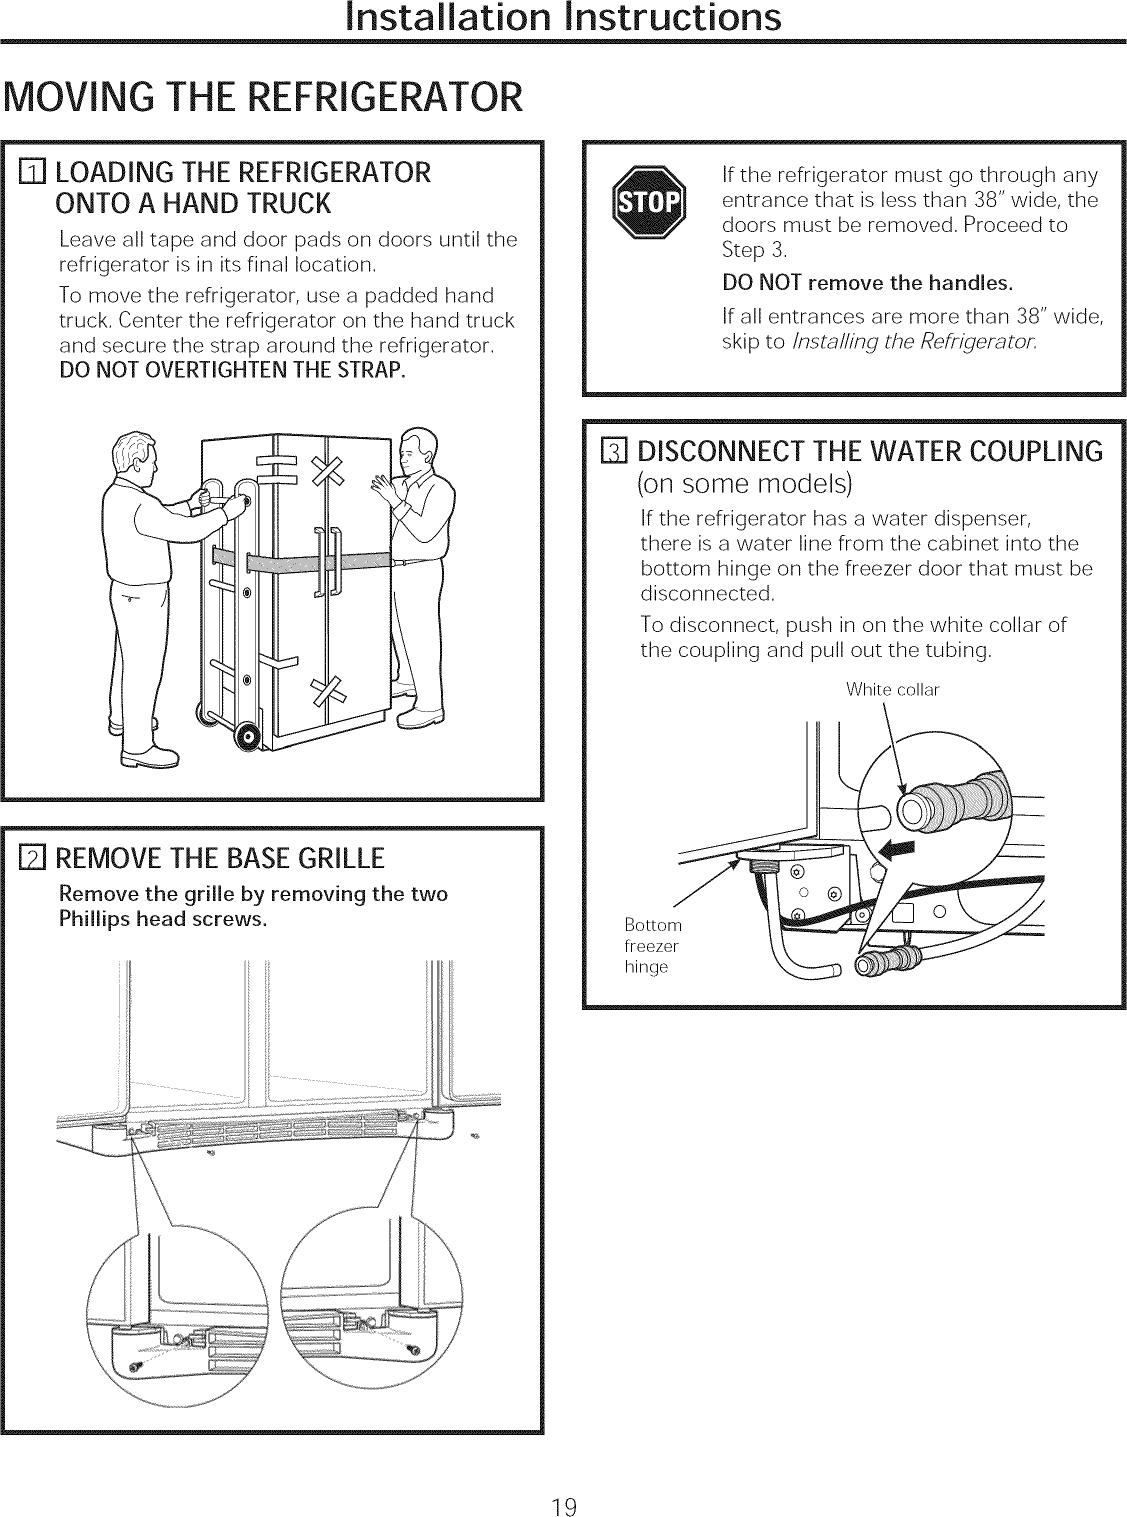 Rtlb Baja Designs Wiring Diagram Trusted Diagrams Ttr 250 Ge Dse25jghbcww User Manual Refrigerator Manuals And Guides 1410325l